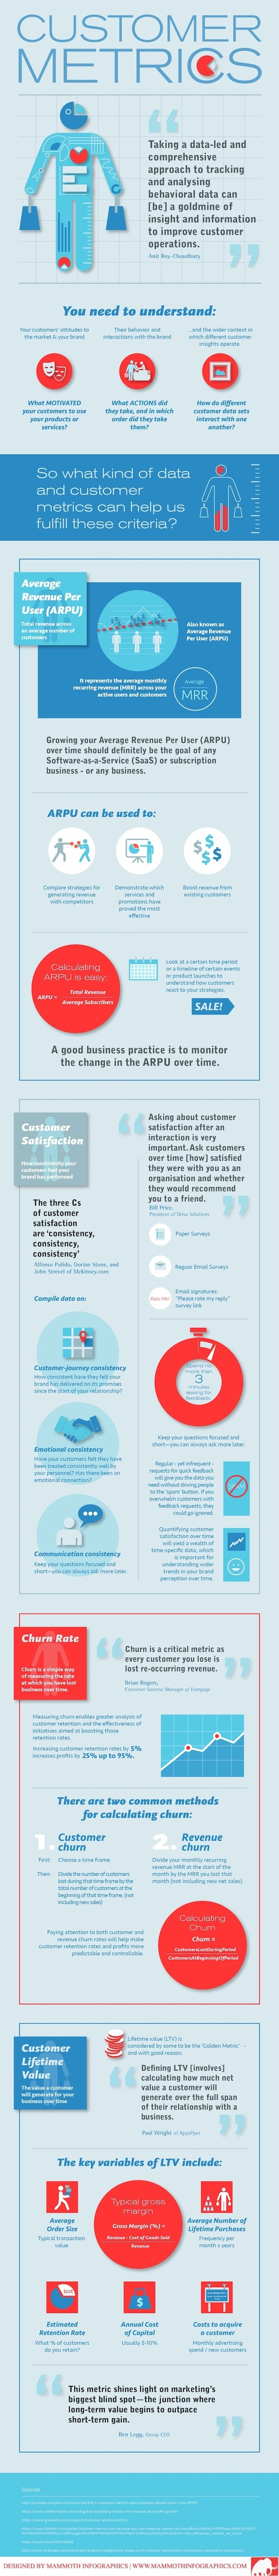 Key Customer Metrics You Need to be Tracking (Infographic) - Kissmetrics | Auto Marketing | Scoop.it